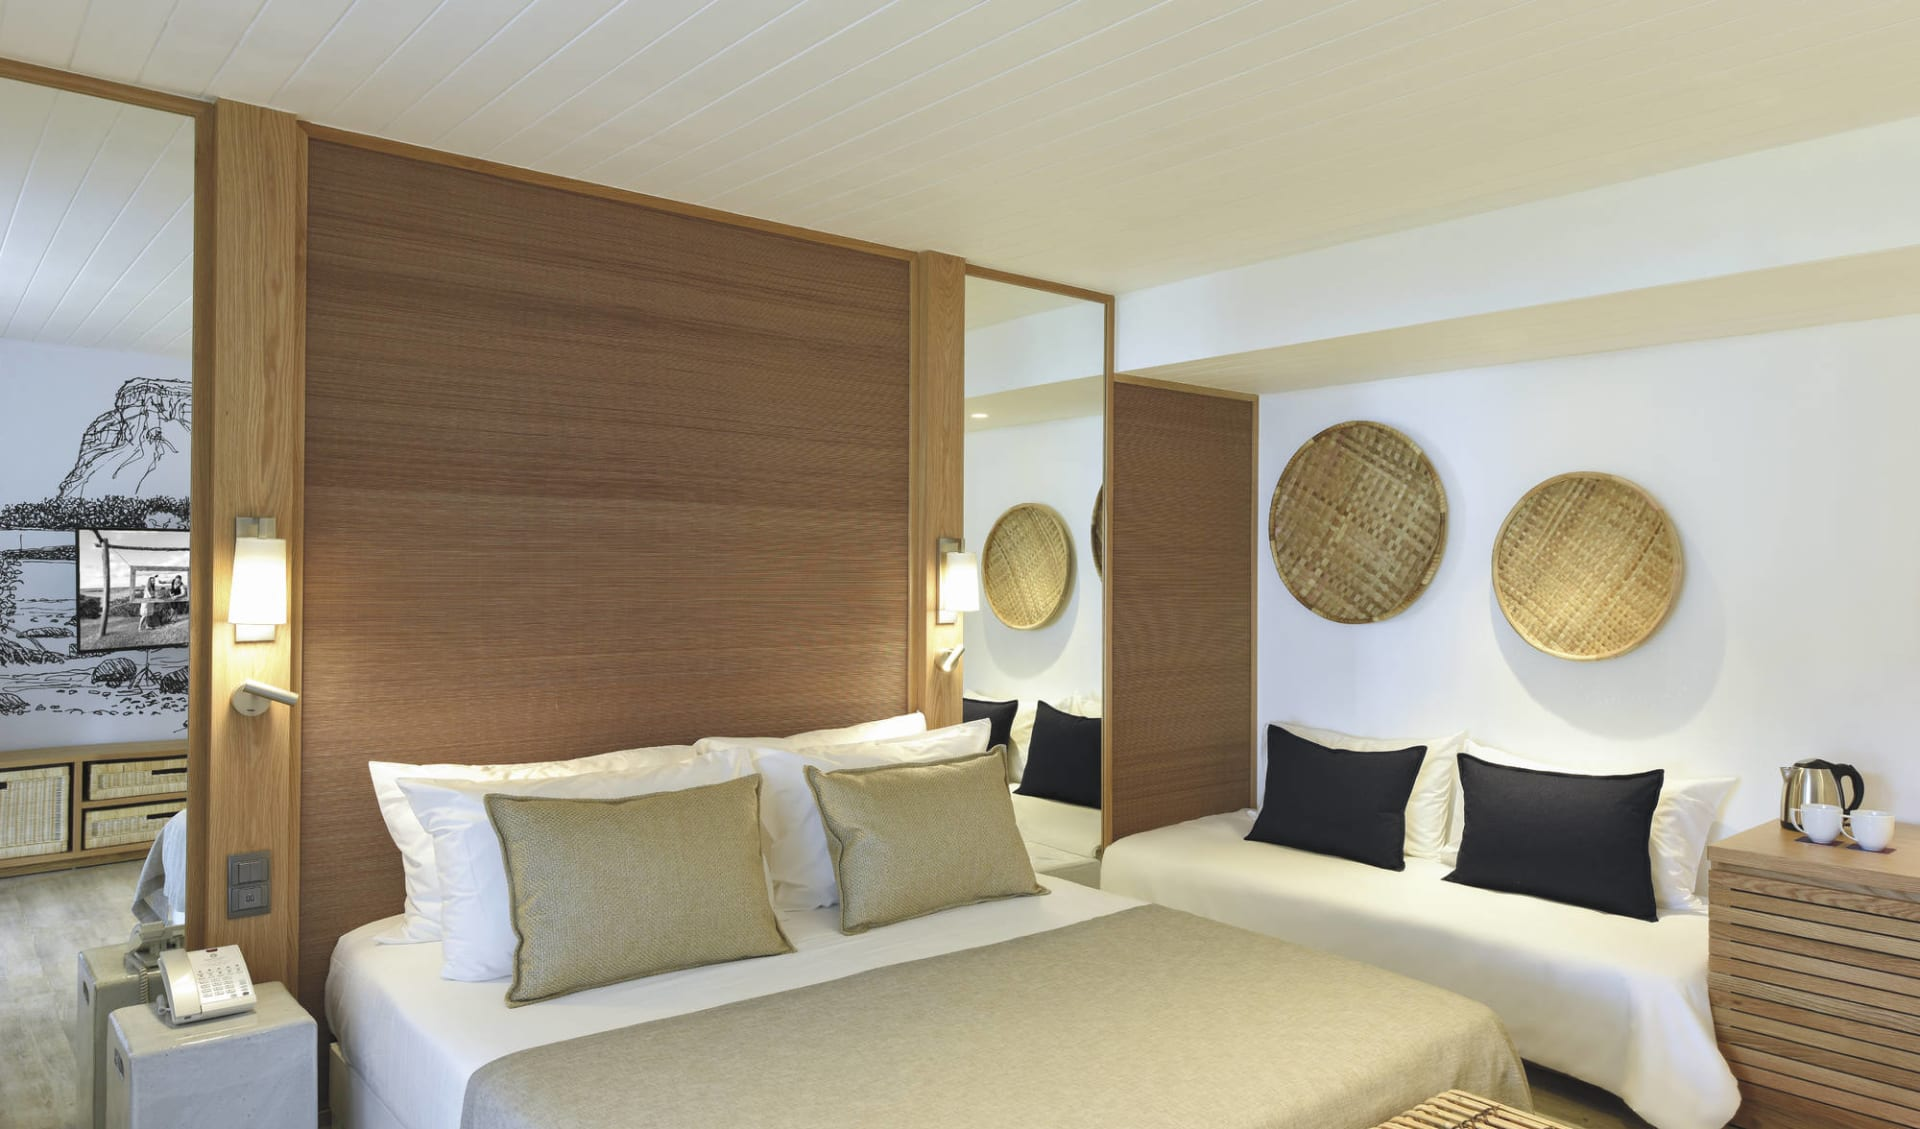 Canonnier Beachcomber Golf Resort & Spa in Pointe aux Canonniers:  Deluxe Sea Facing